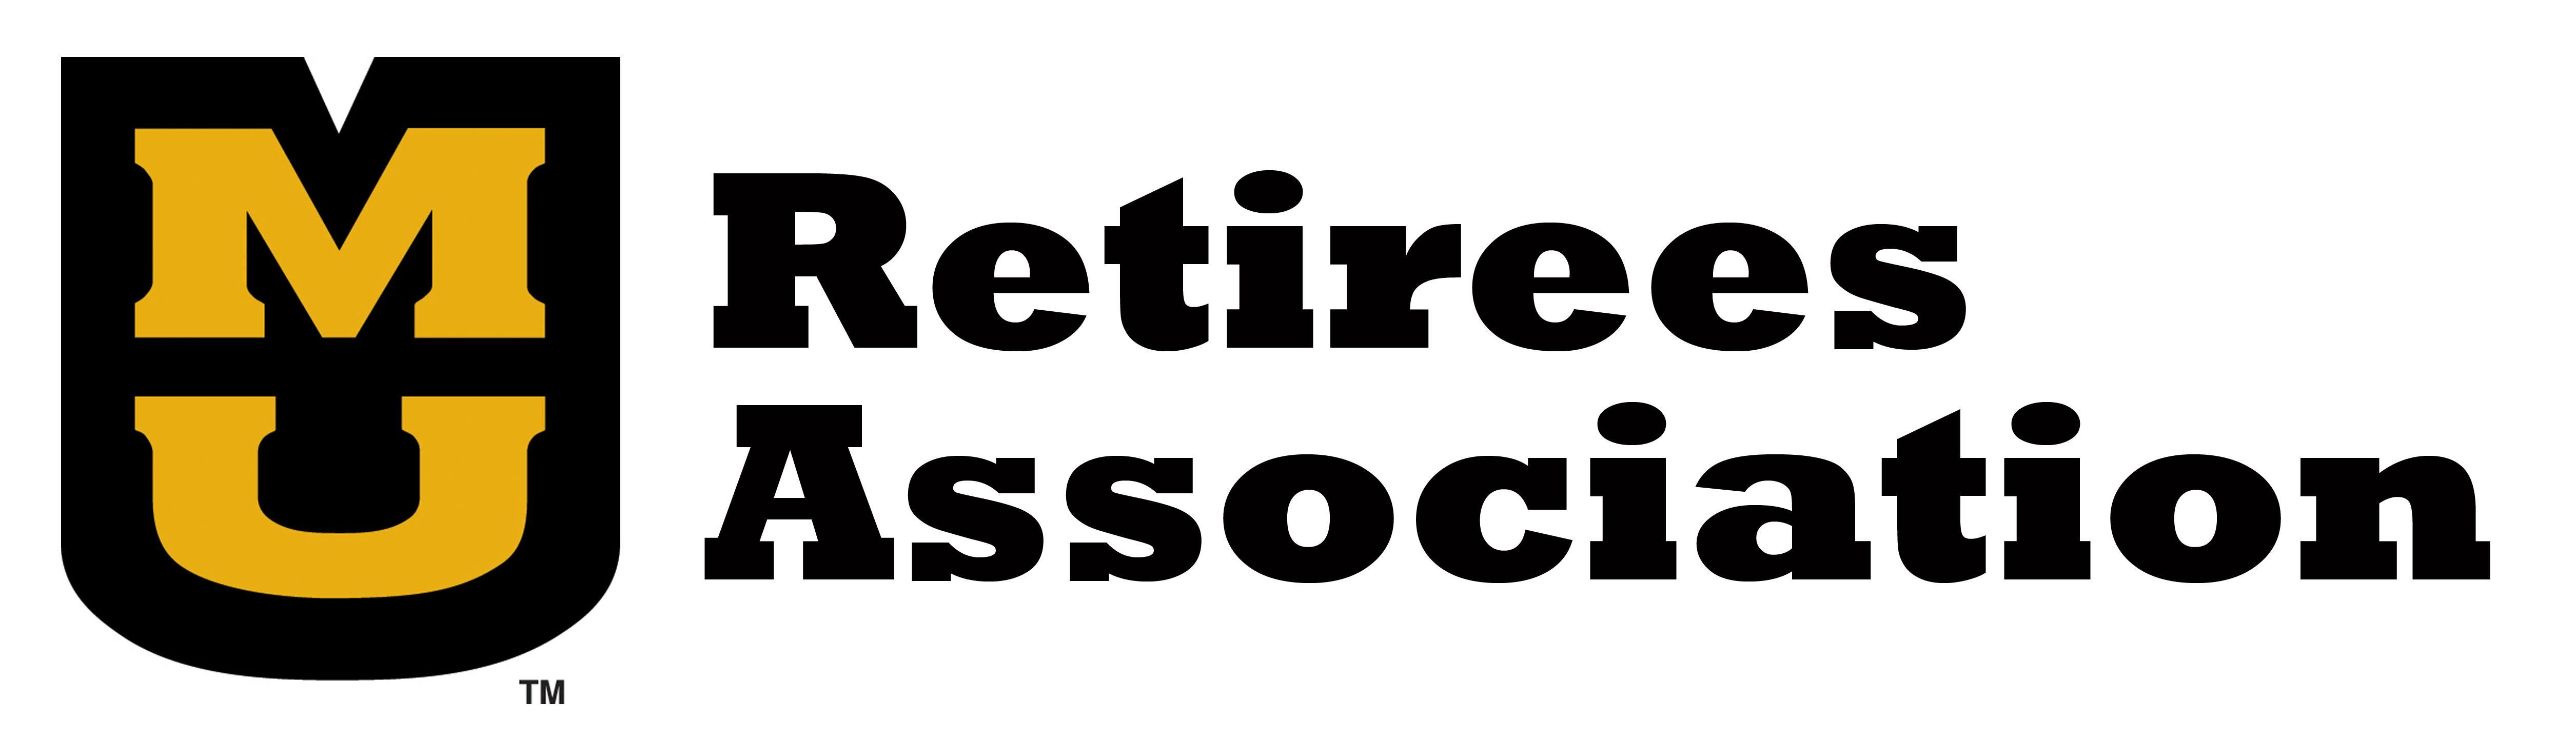 MU Retirees Association